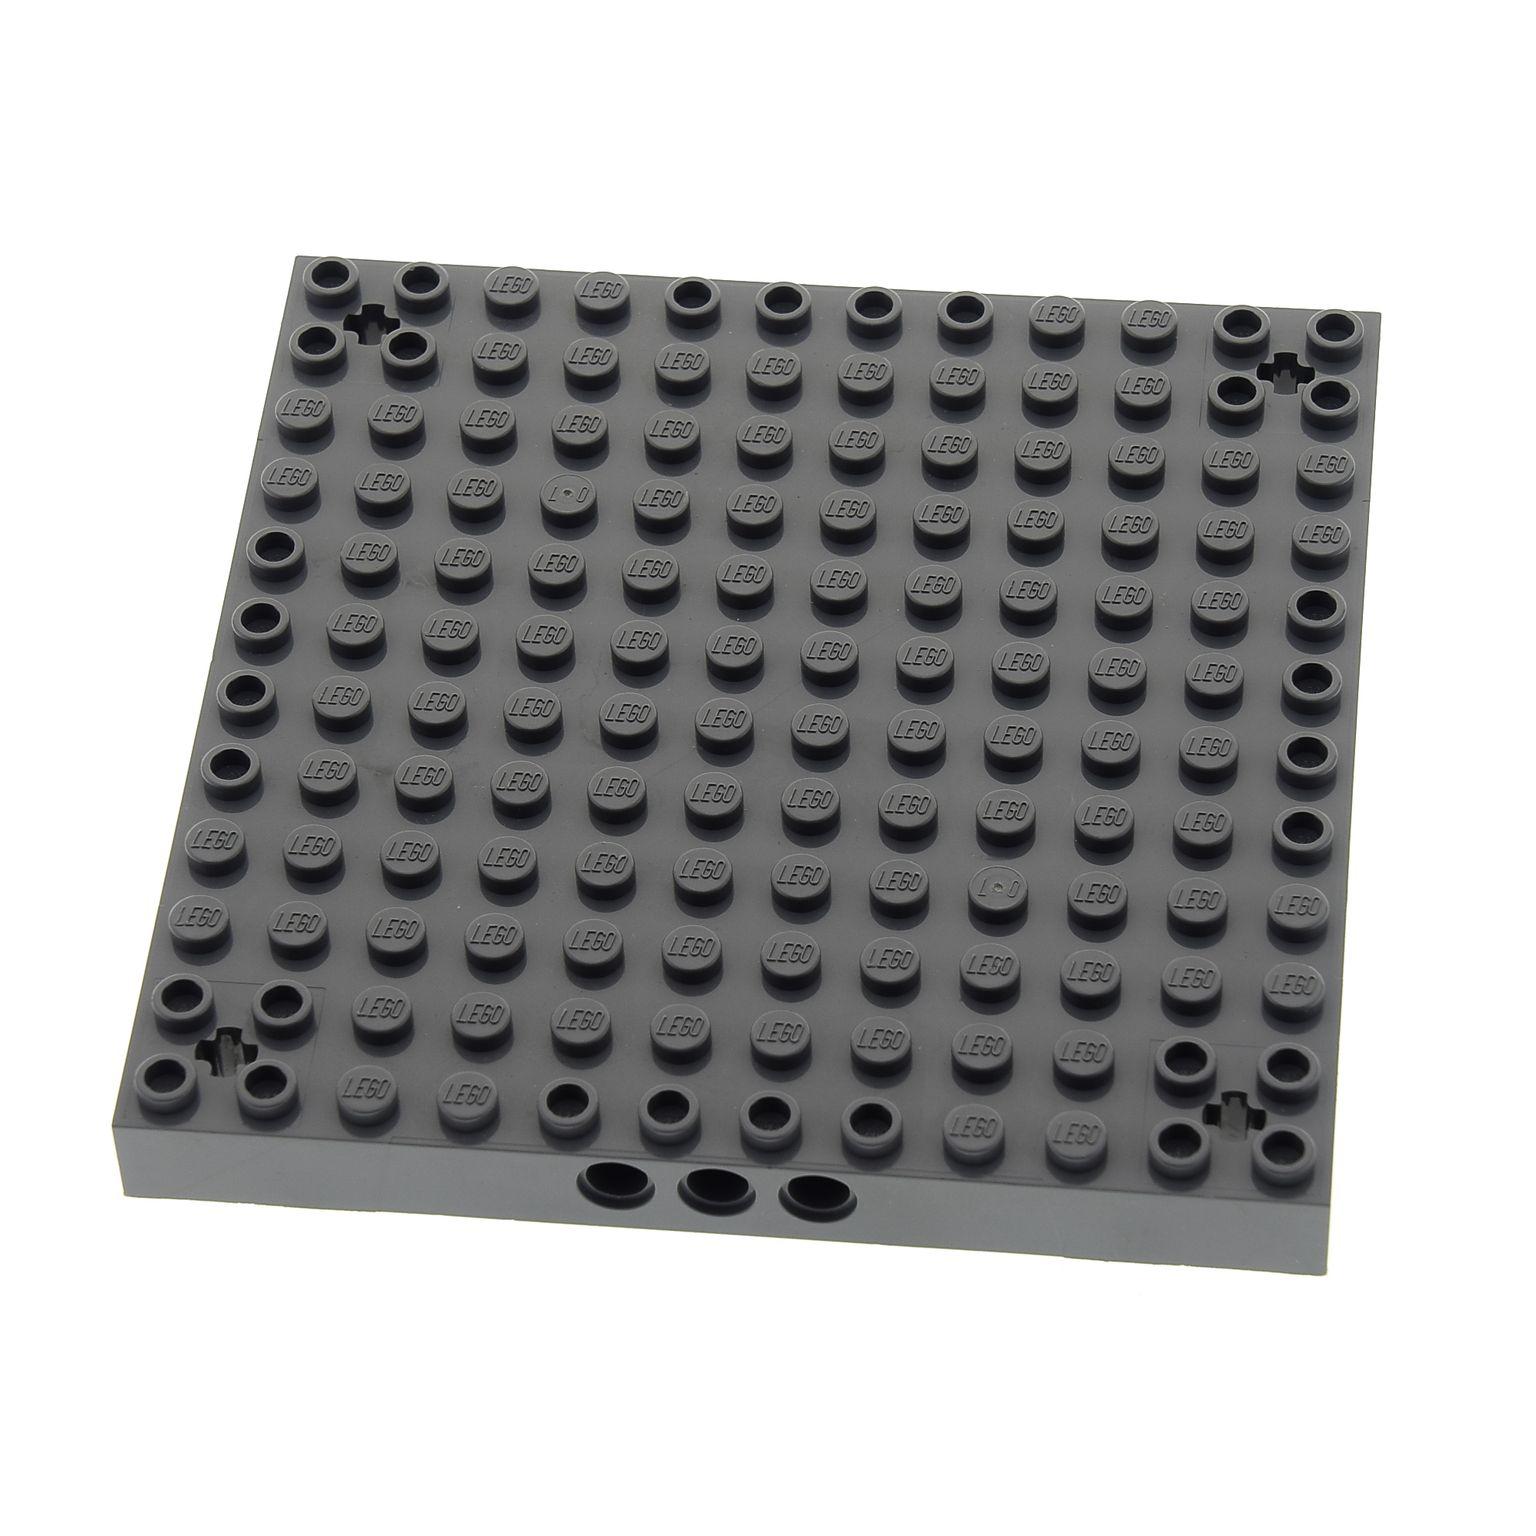 1x Lego System Bau Platte 12x12 neu-dunkel grau Noppen Achs Löcher 4260871 52040